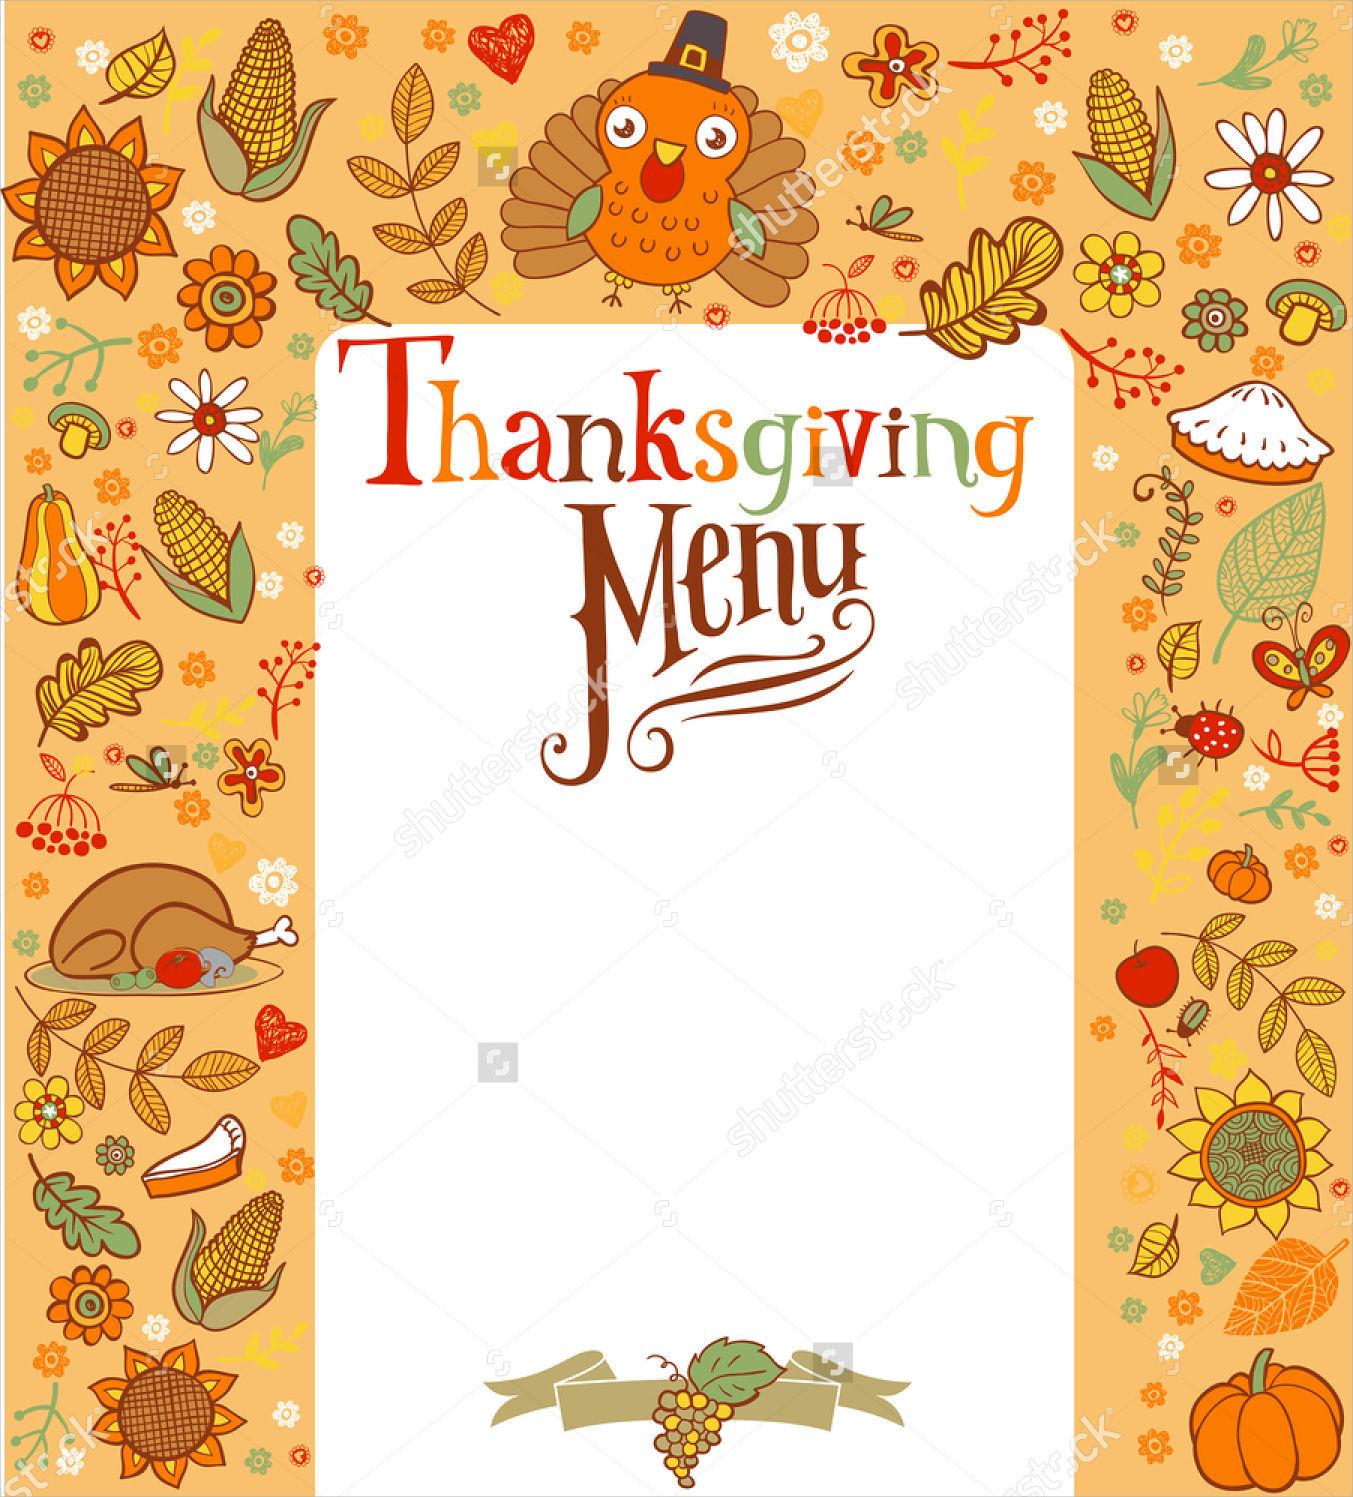 16+ Blank Menu Designs - Psd, Vector Format Download | Design Trends - Free Printable Thanksgiving Menu Template